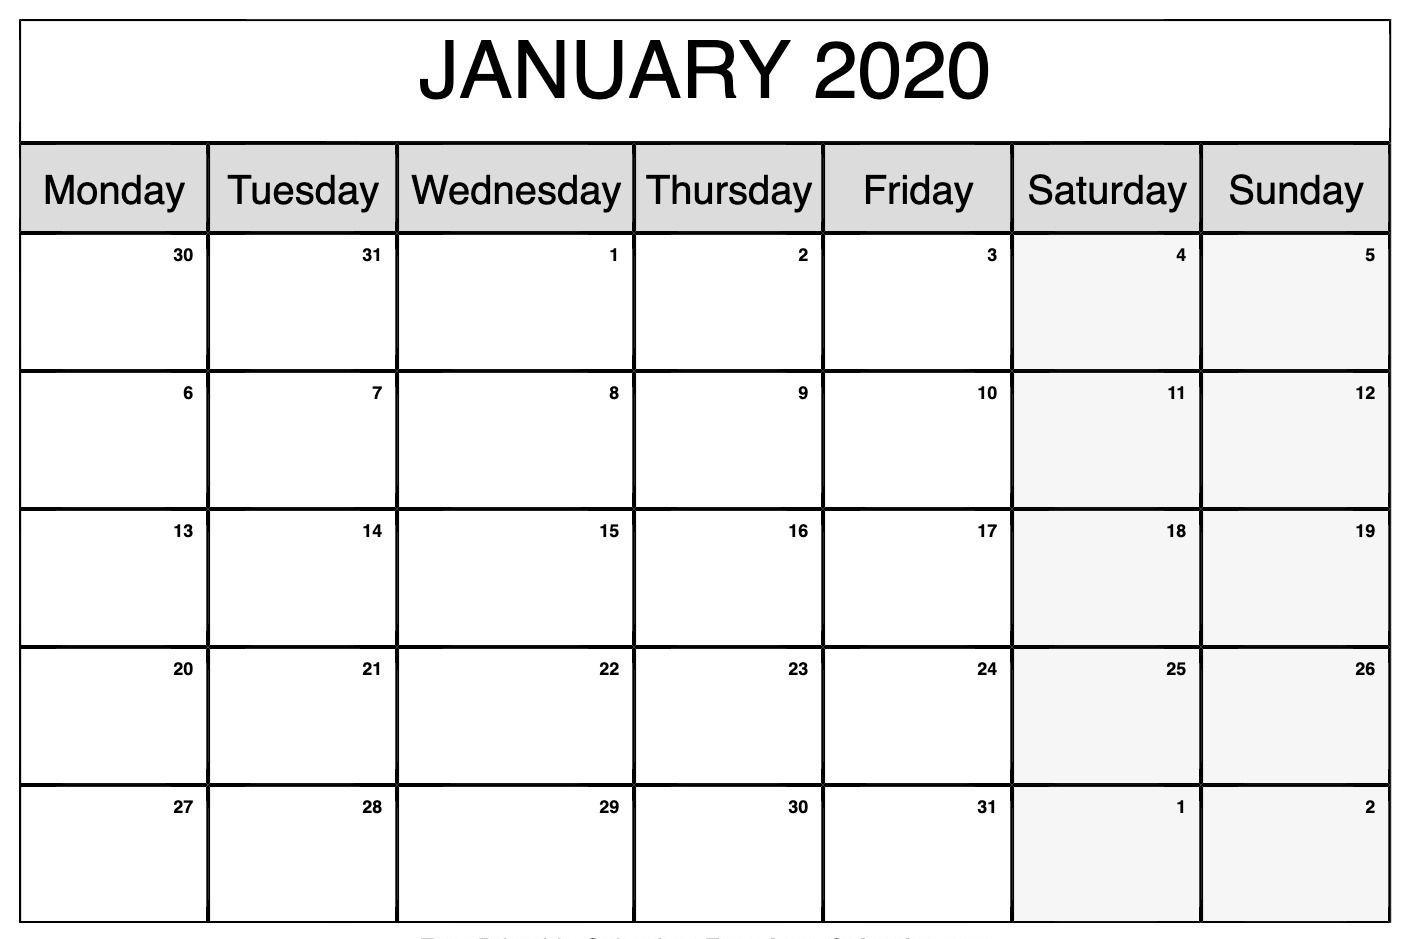 January 2020 Monthly Calendar – Plan Jan Month With Holidays  Editable Baptist Calendar 2020 Printable